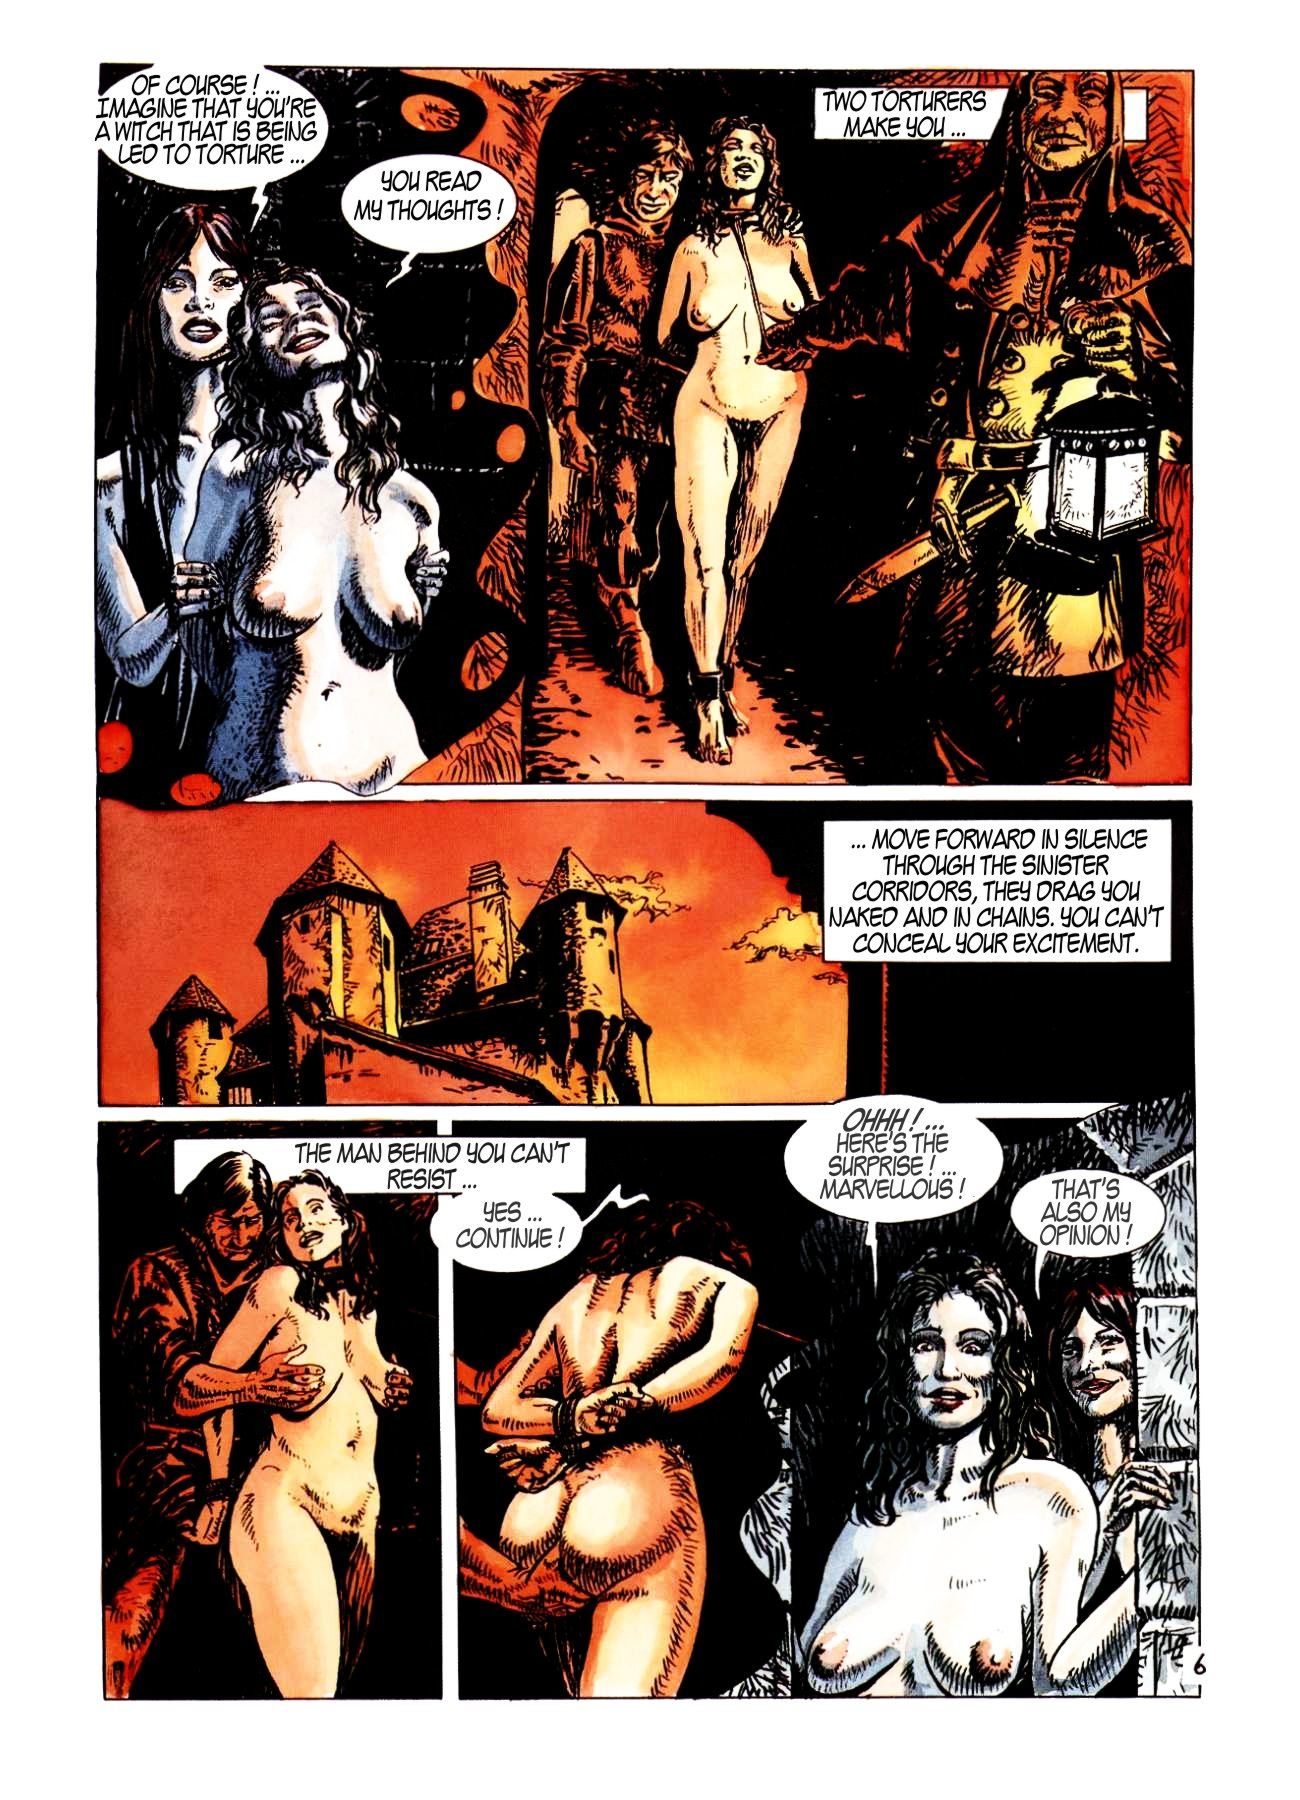 Medieval lady hentai erotica comic